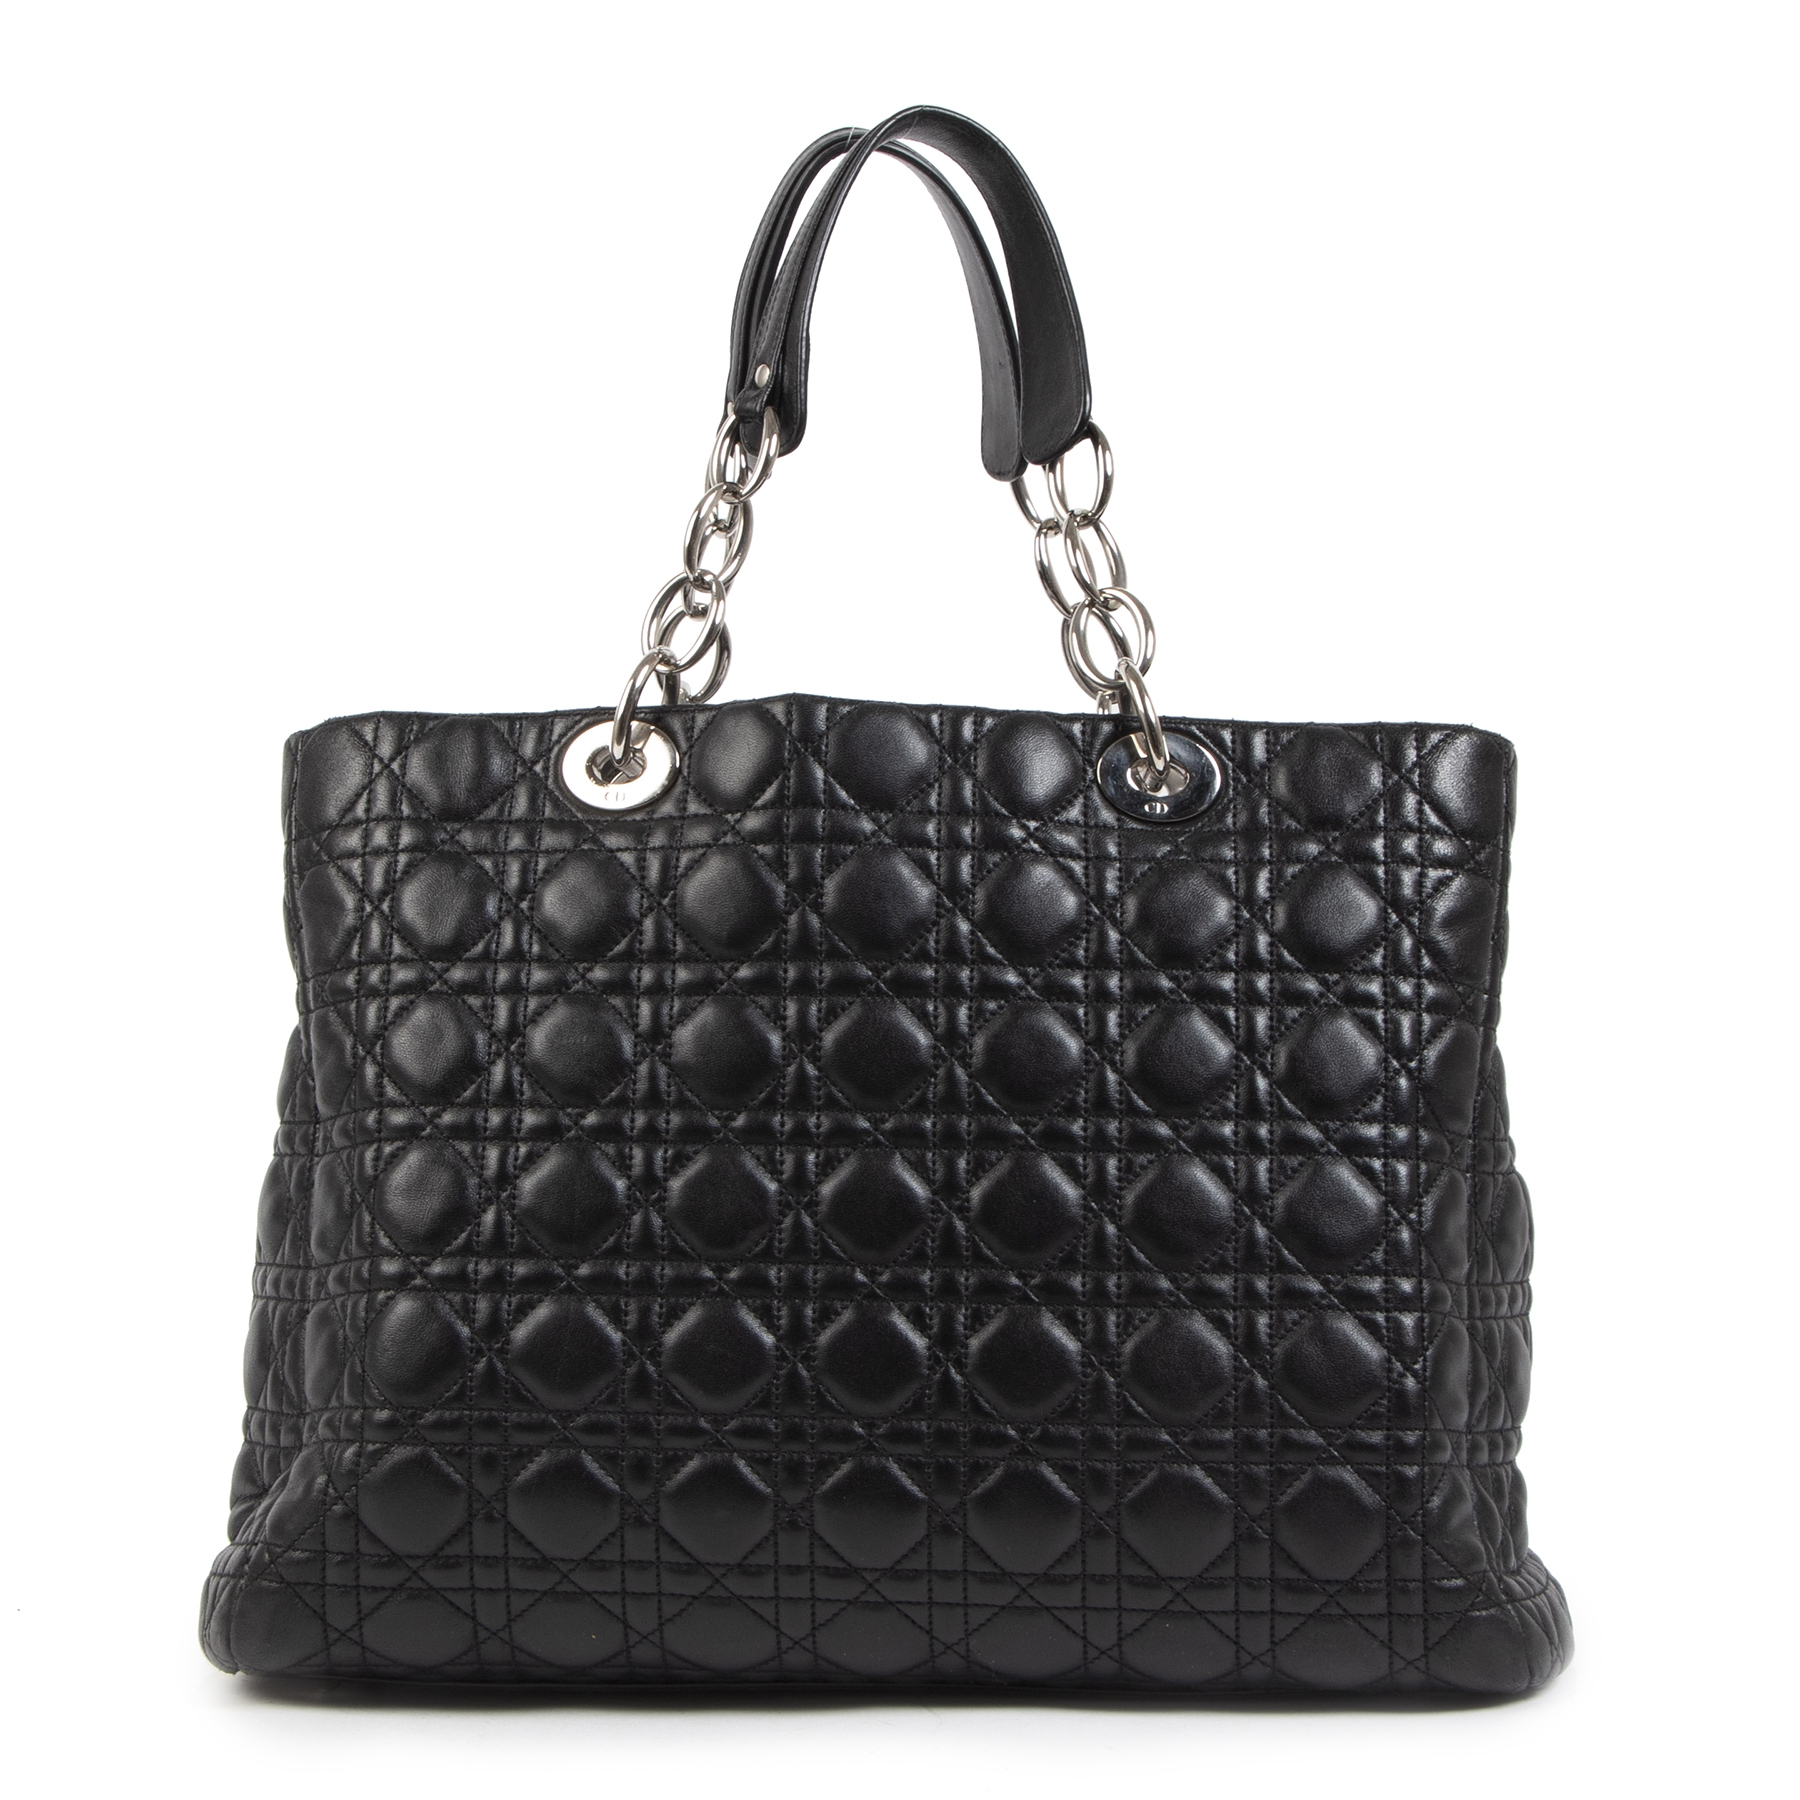 Authentieke tweedehands vintage Dior Black Large Shopping Tote koop online webshop LabelLOV